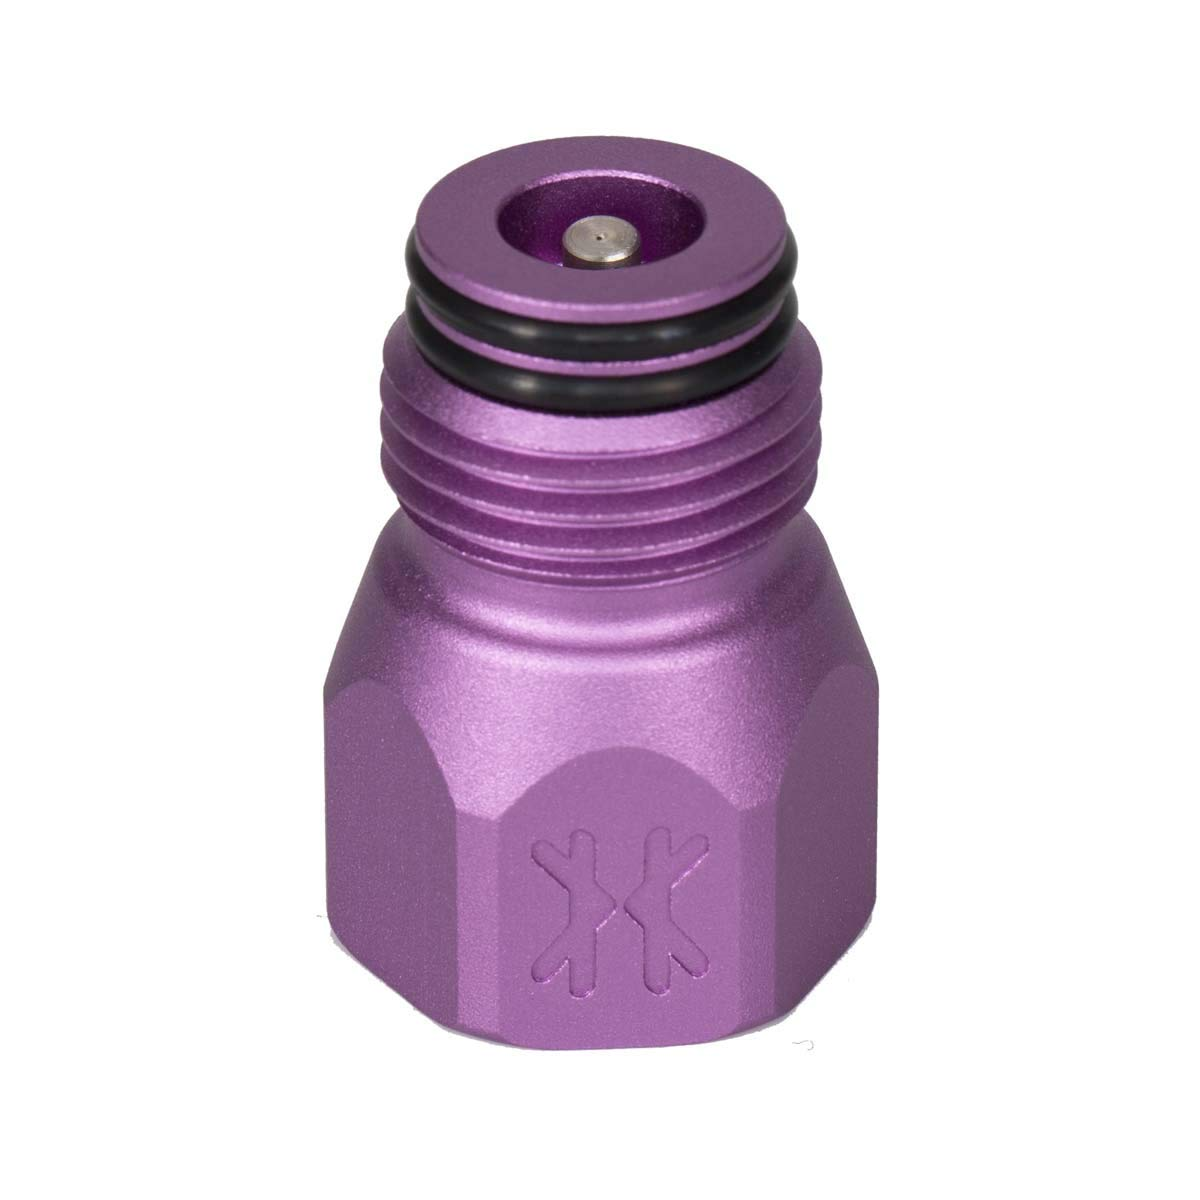 HK Army Paintball Regulator Extender - Purple by HK Army